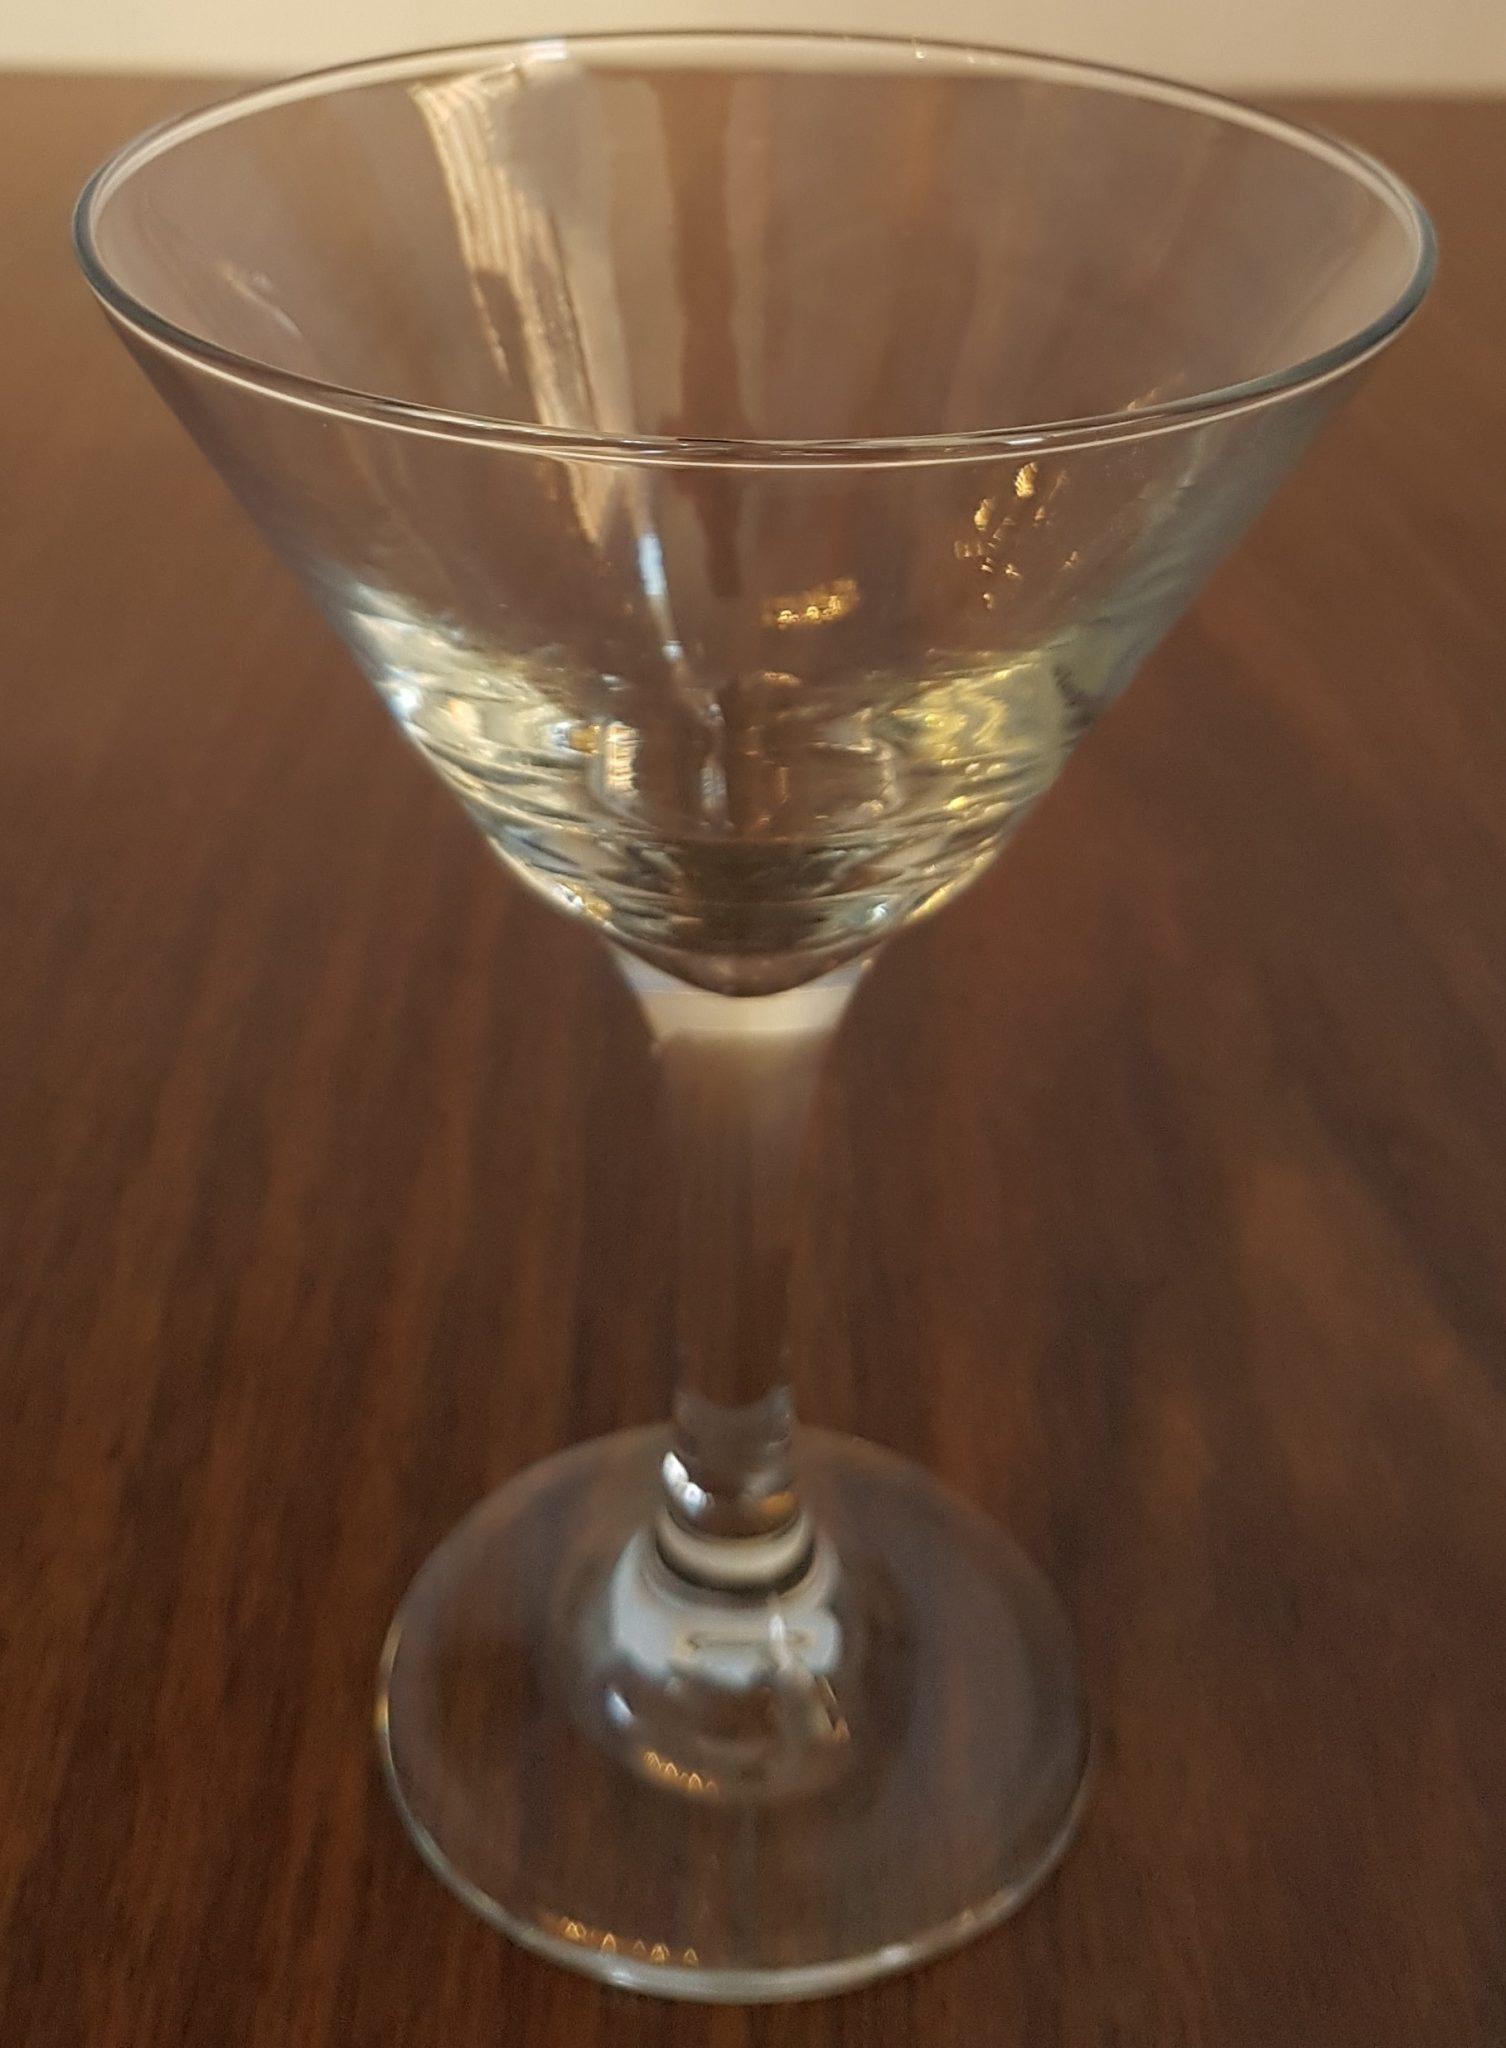 Martini_Glass_9.25_ounce